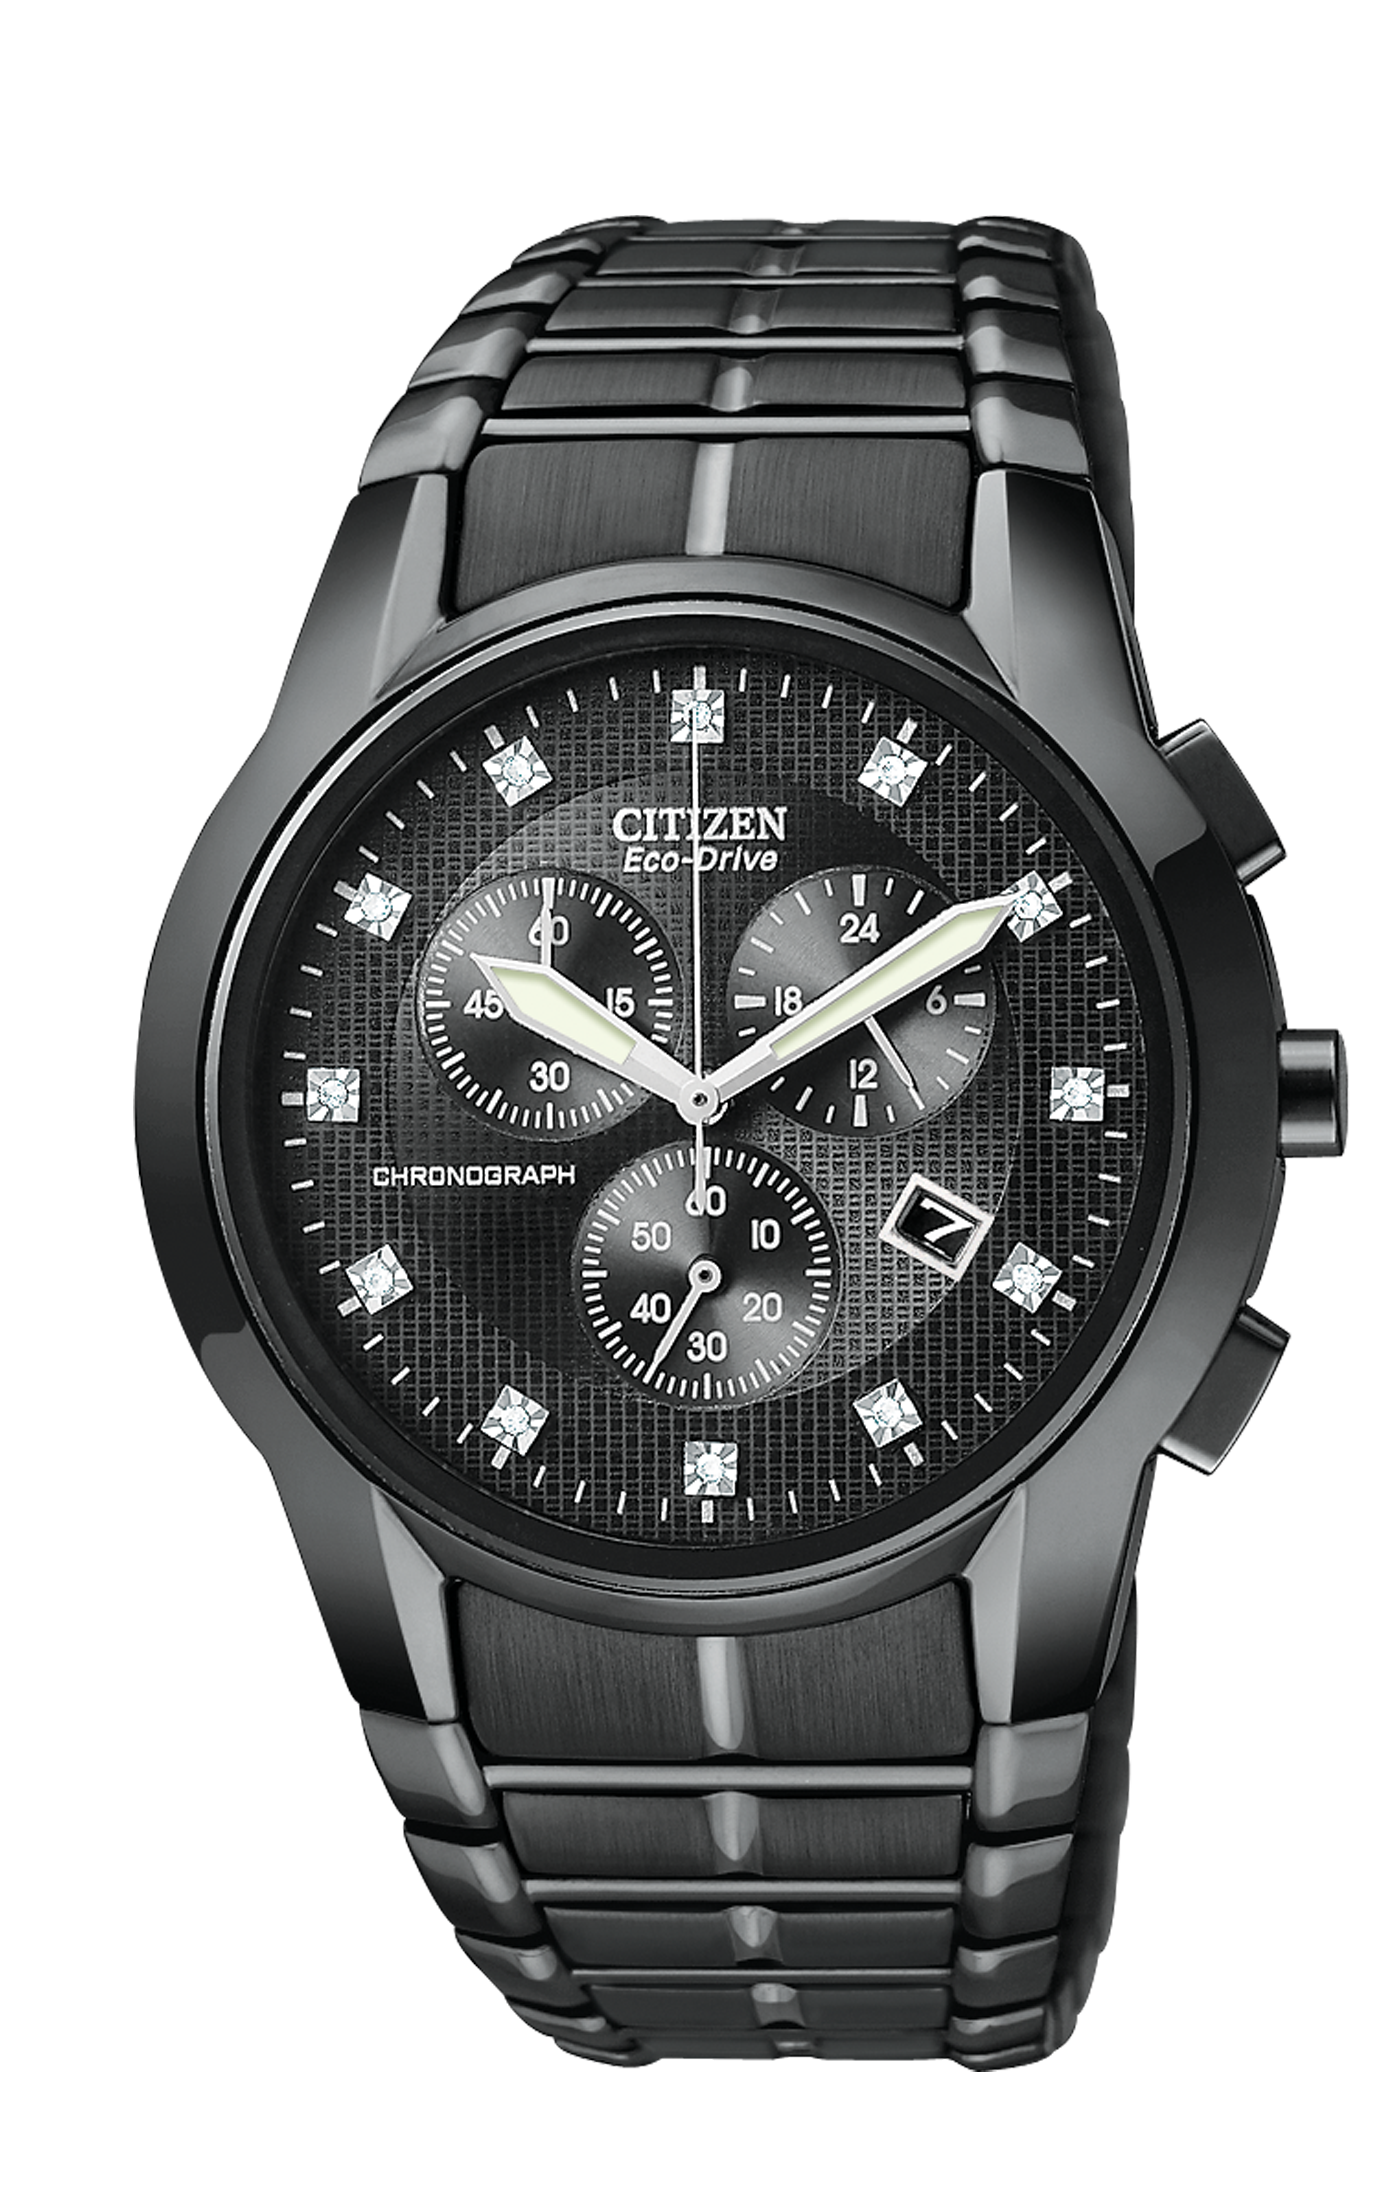 Watch detail citizen watch menus chronograph model atg